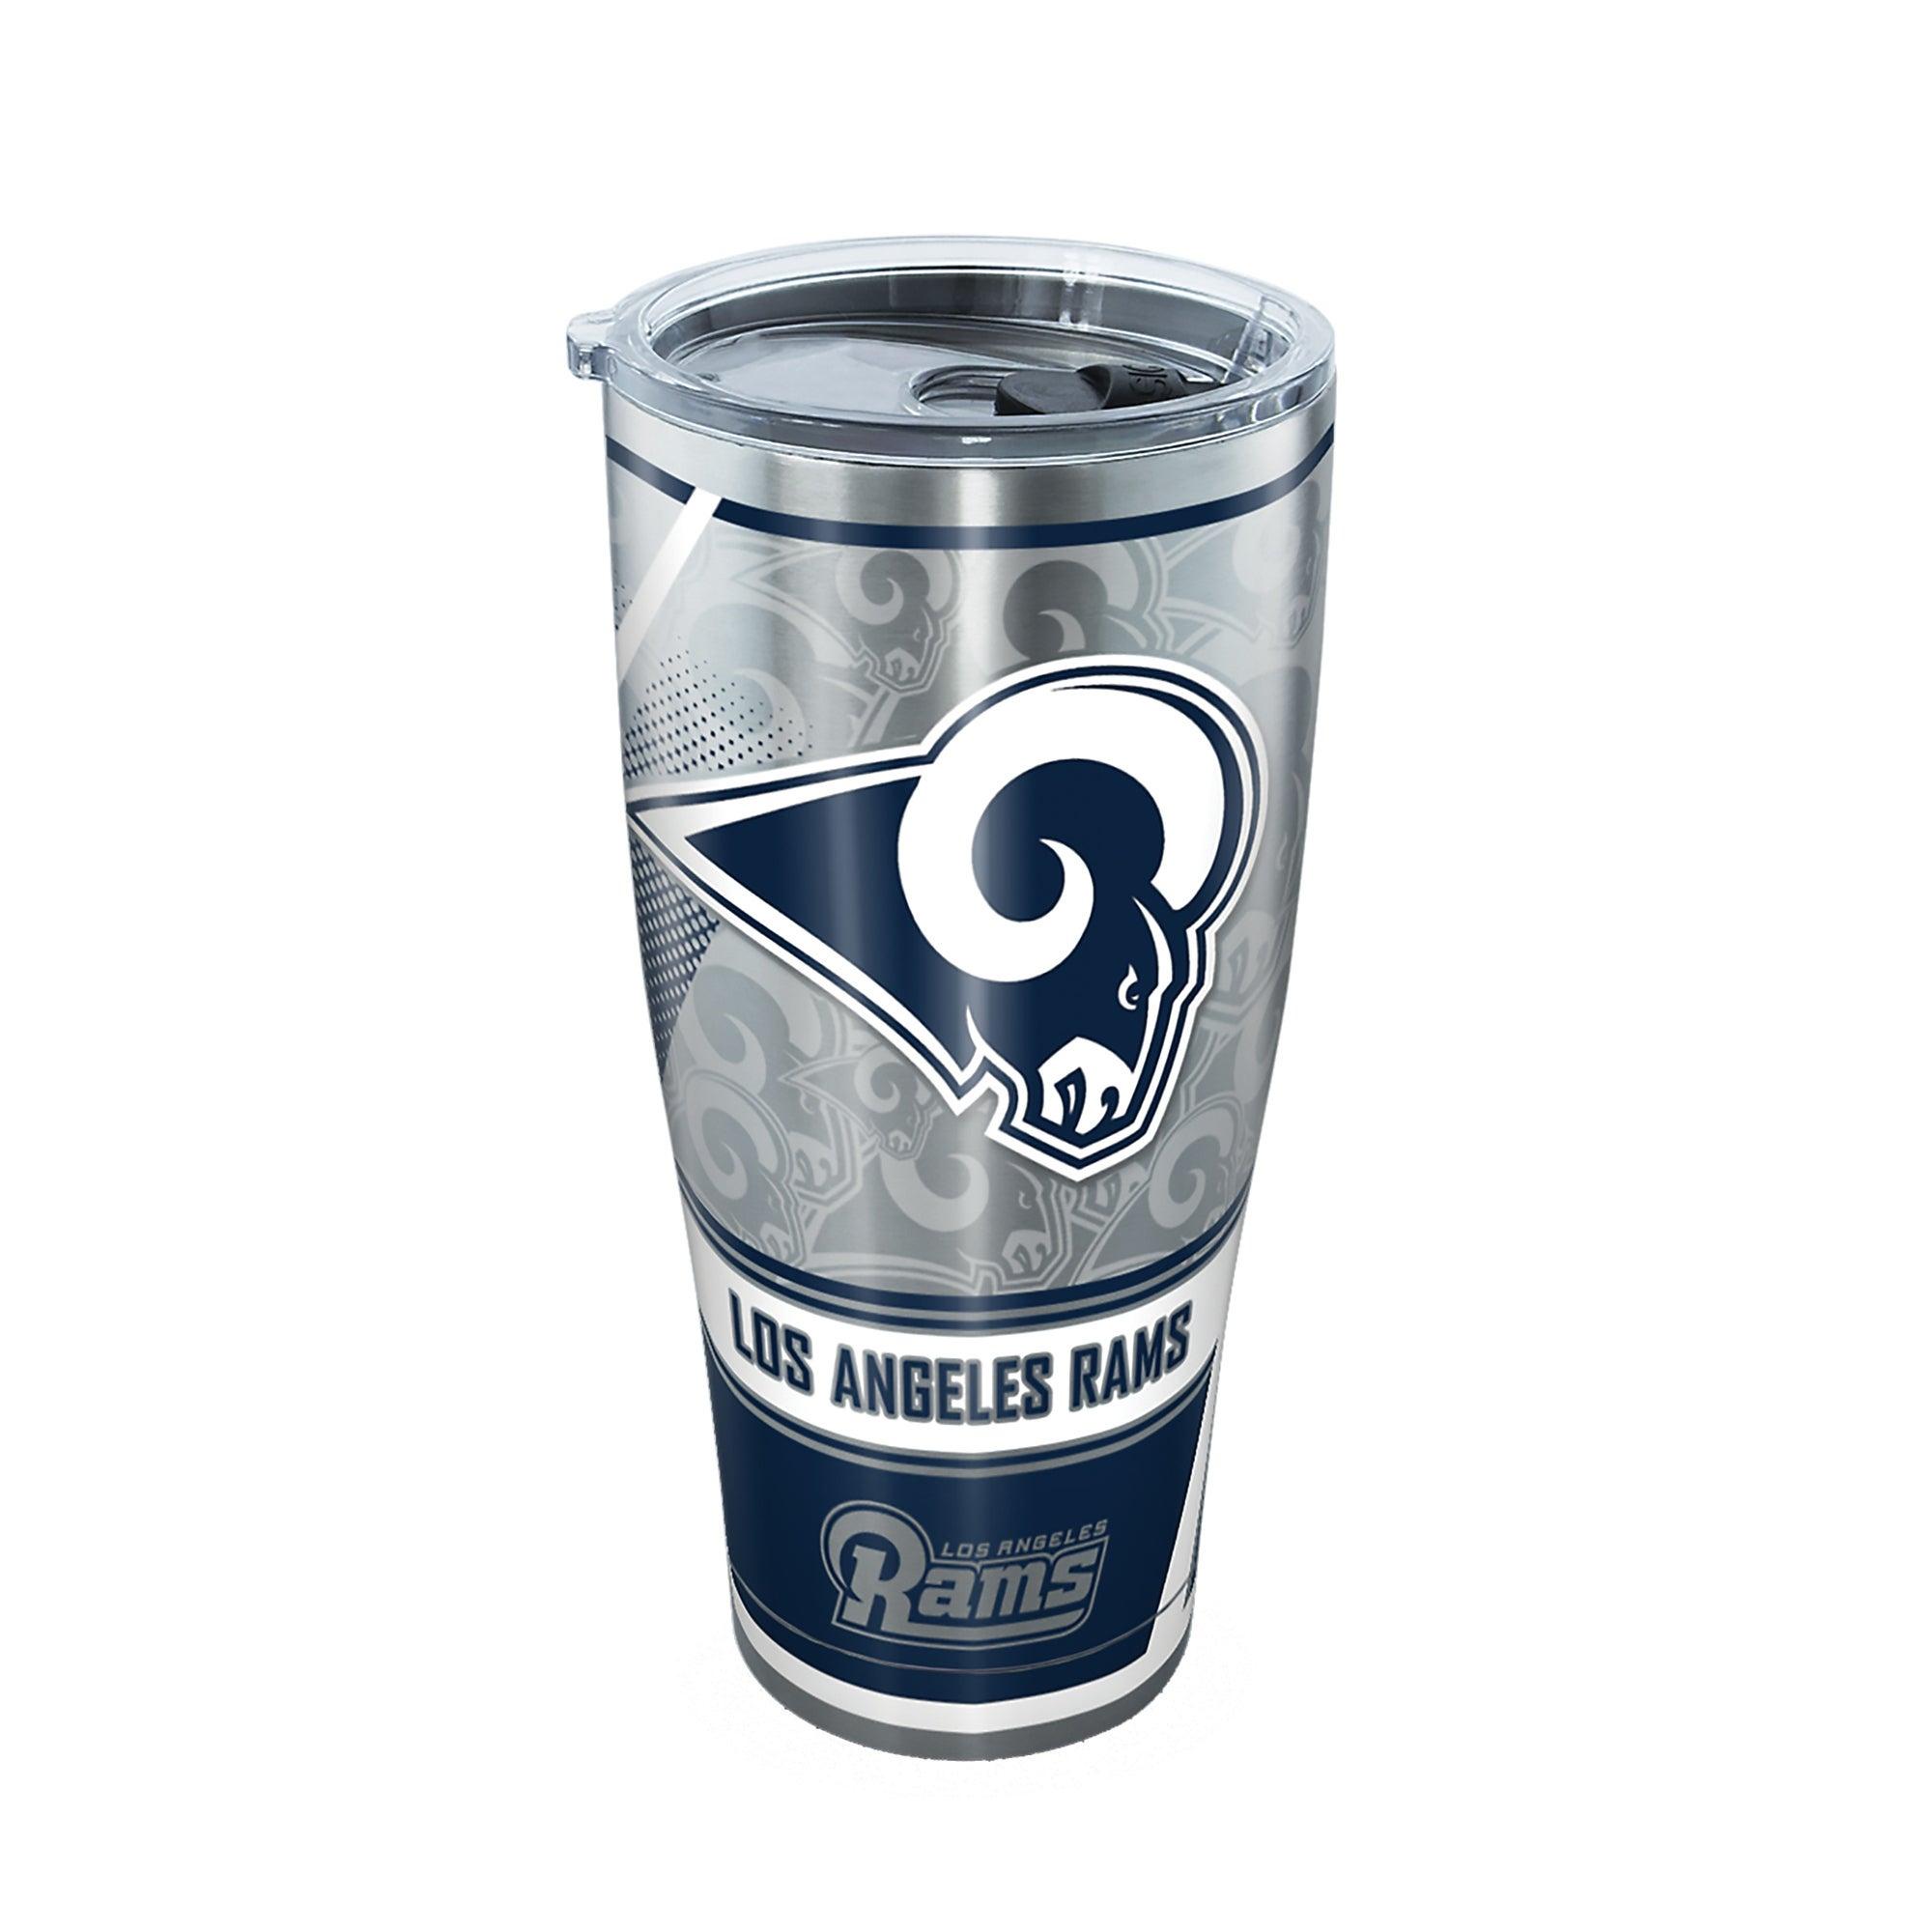 NFL Los Angeles Rams 20oz Insulated Acrylic Tumbler